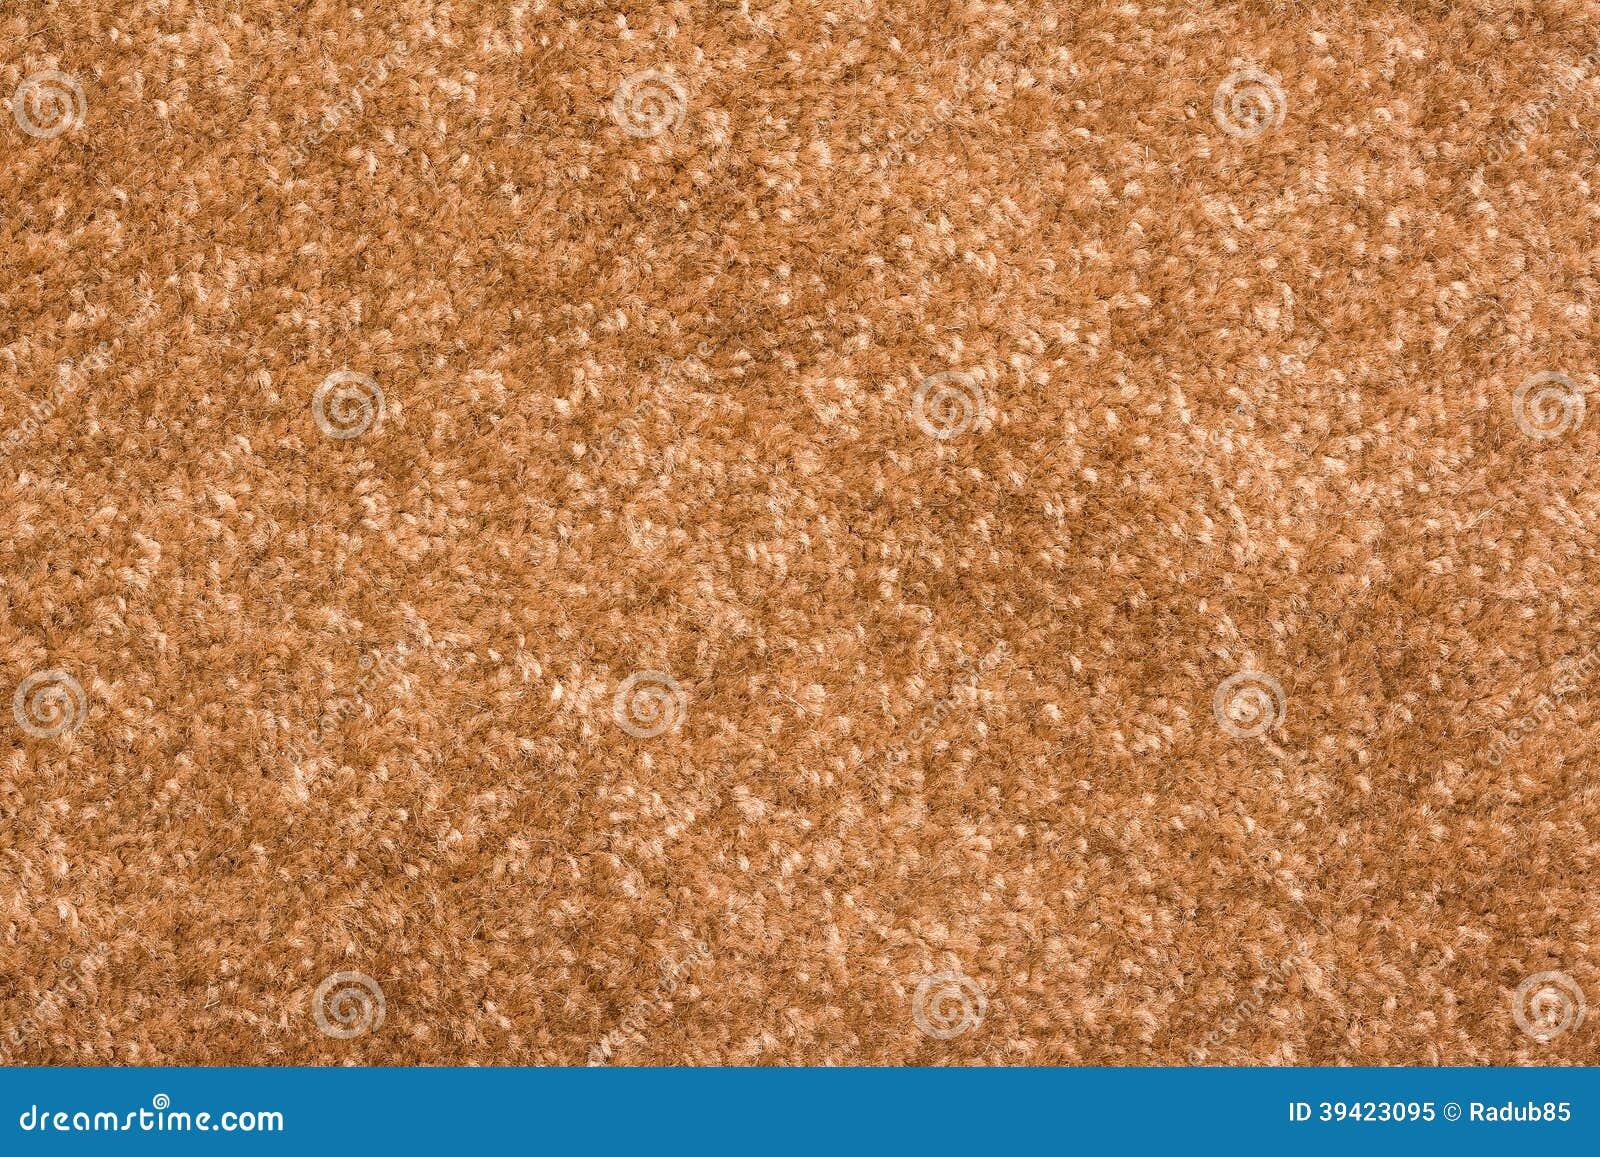 Dark beige carpet texture stock photo image 39423095 for Dark beige carpet texture